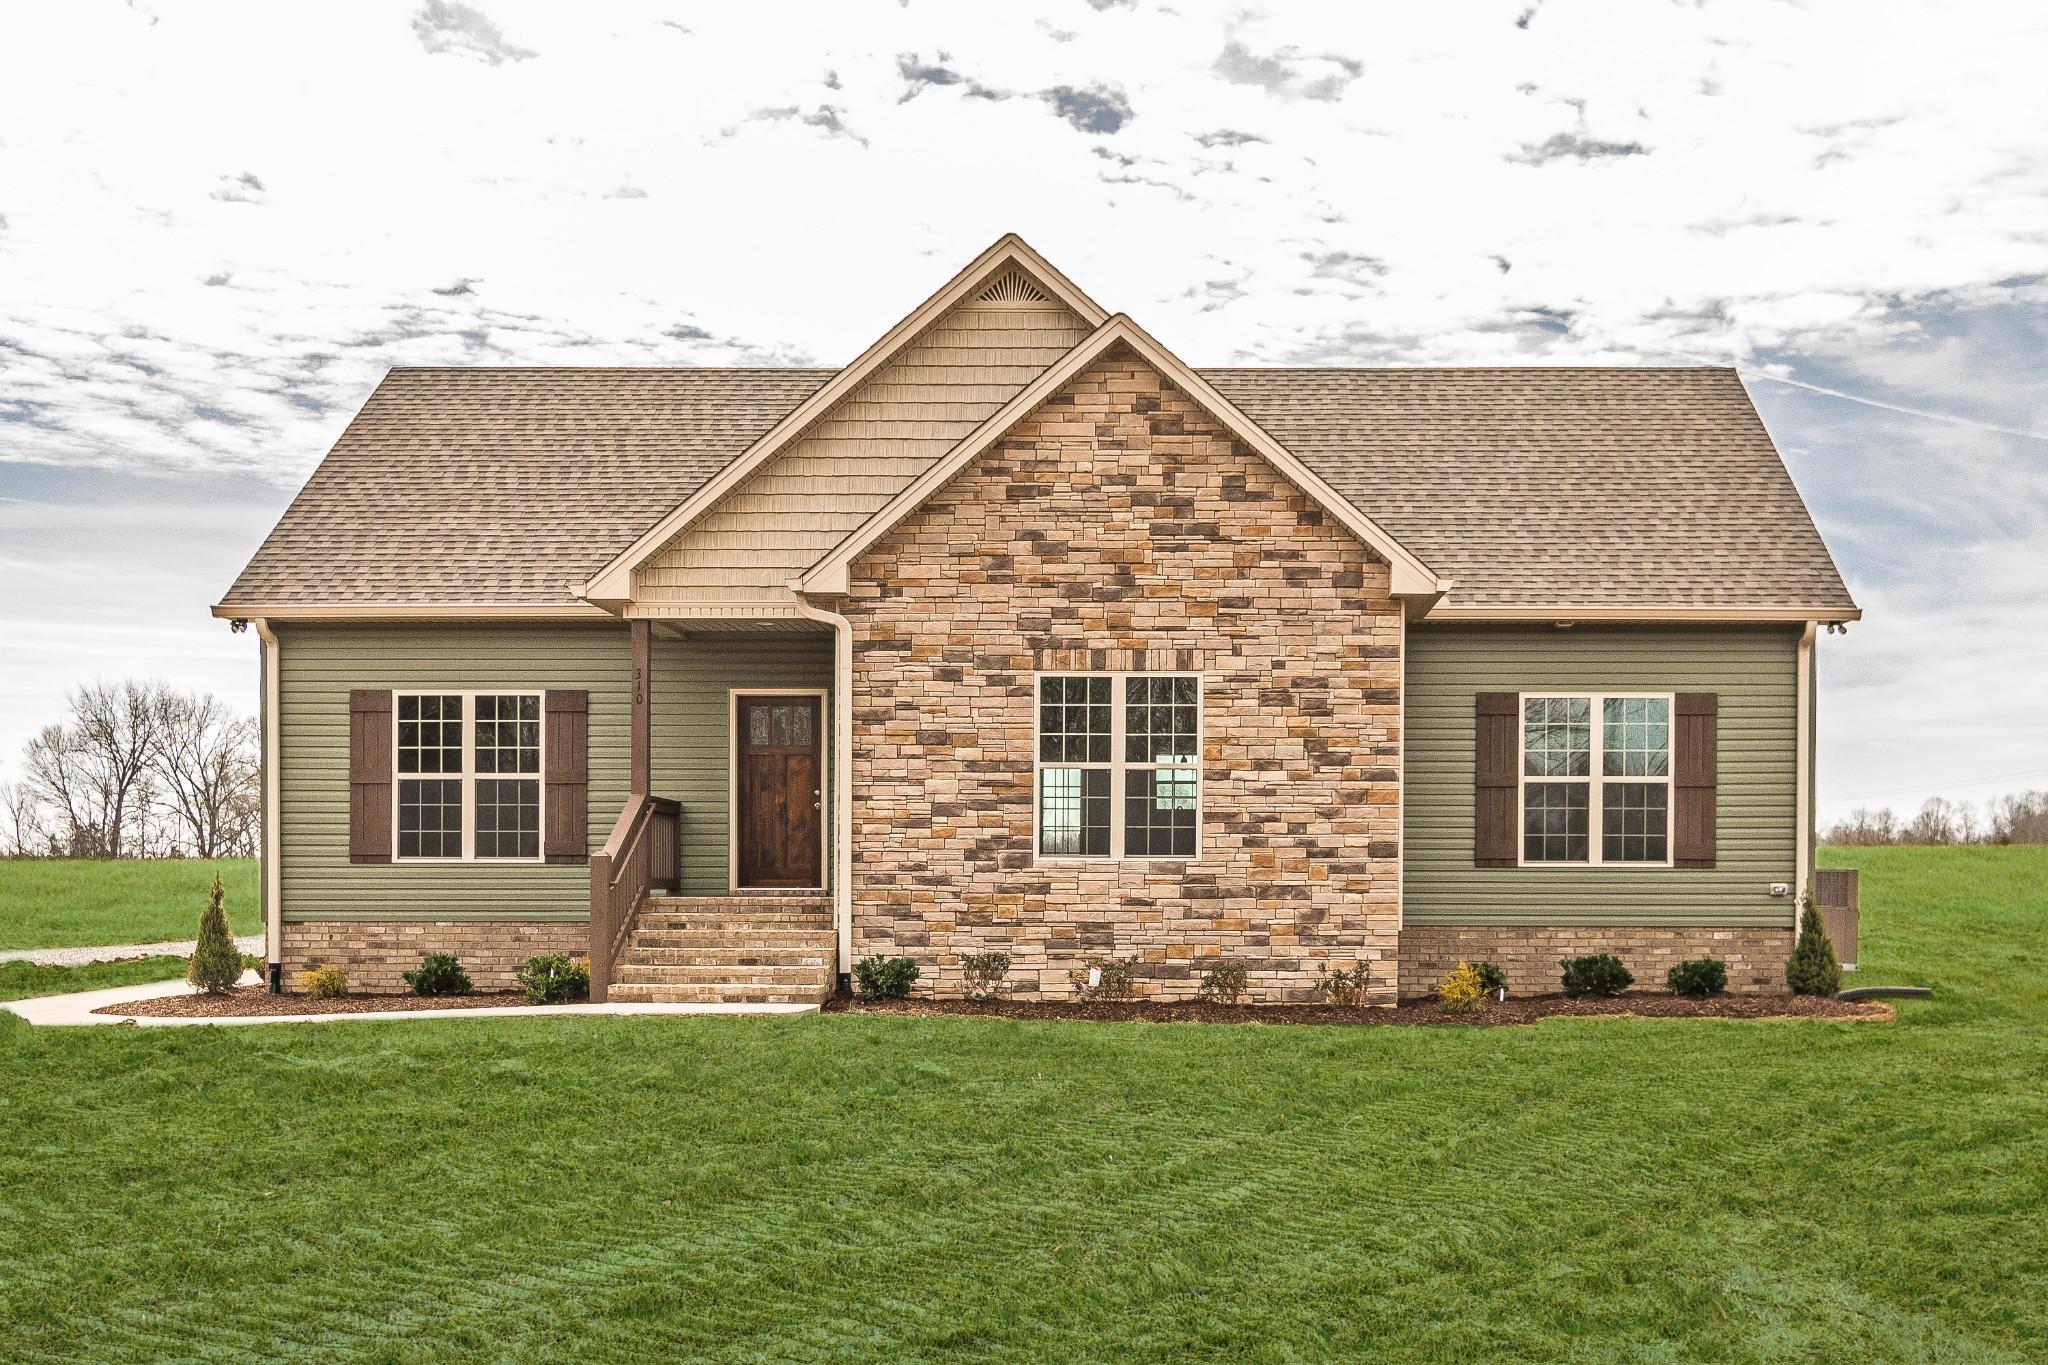 310 Butler Bridge Rd, Portland, TN 37148 - Portland, TN real estate listing